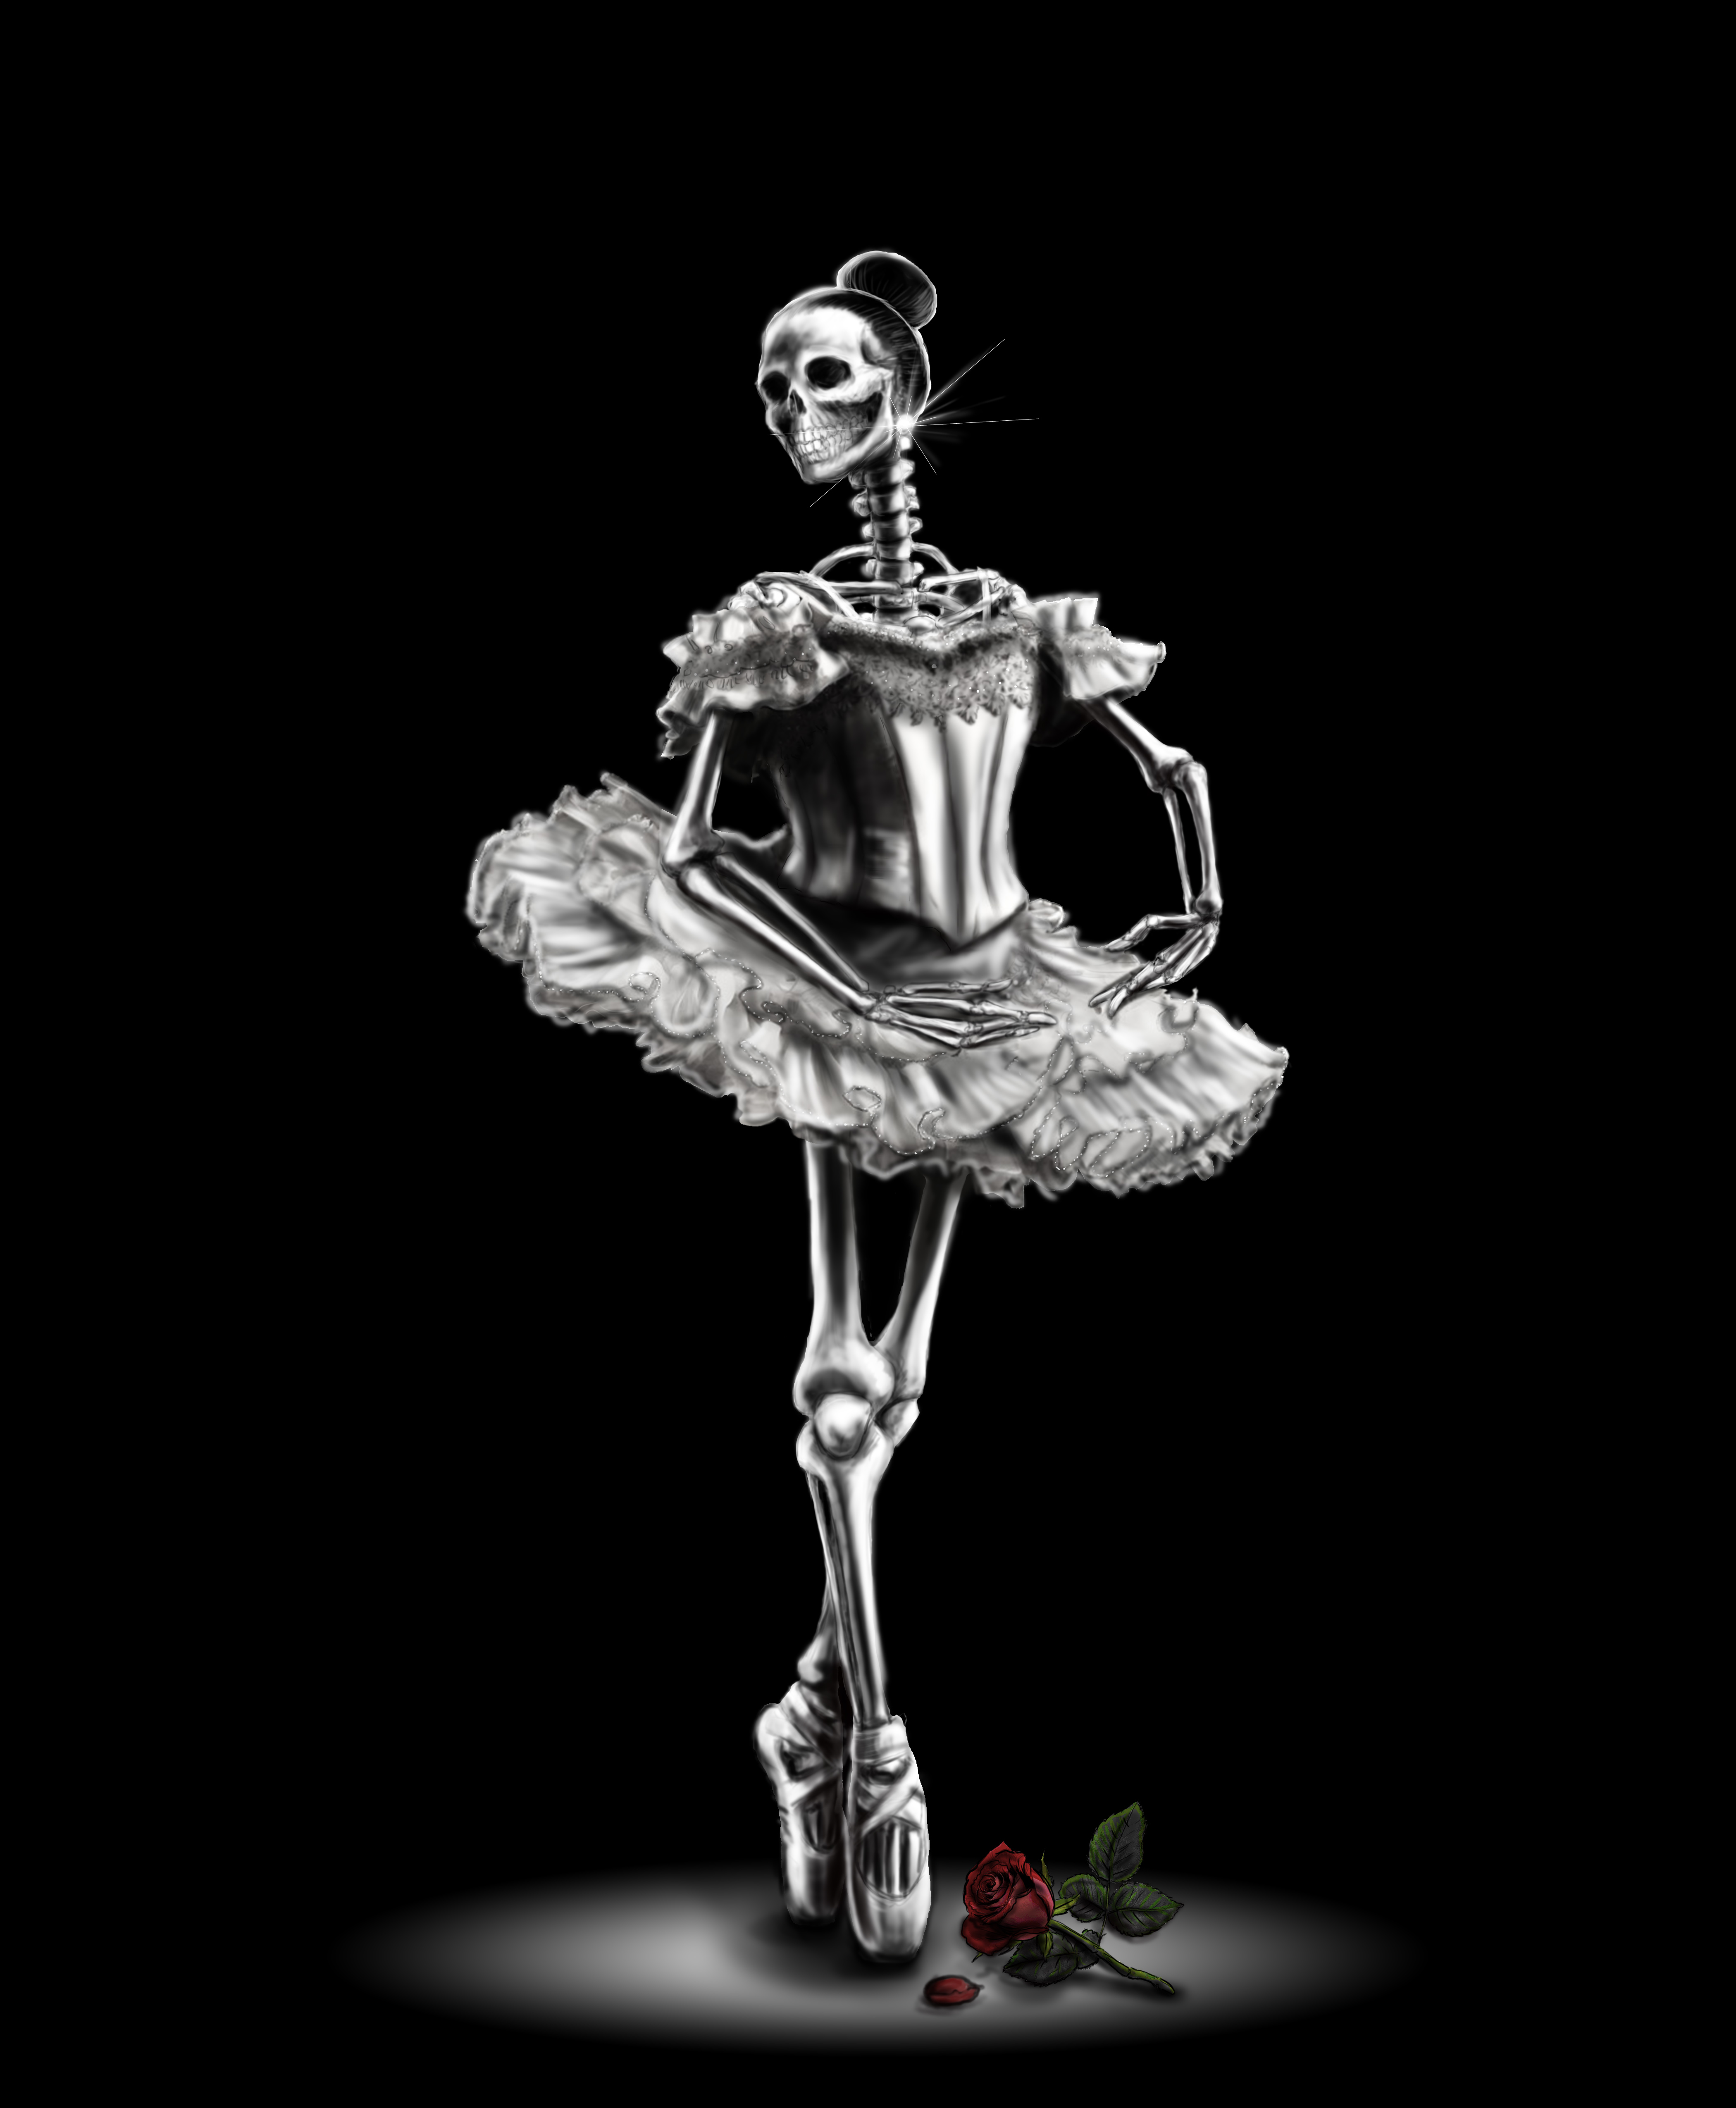 Ballerina_v3